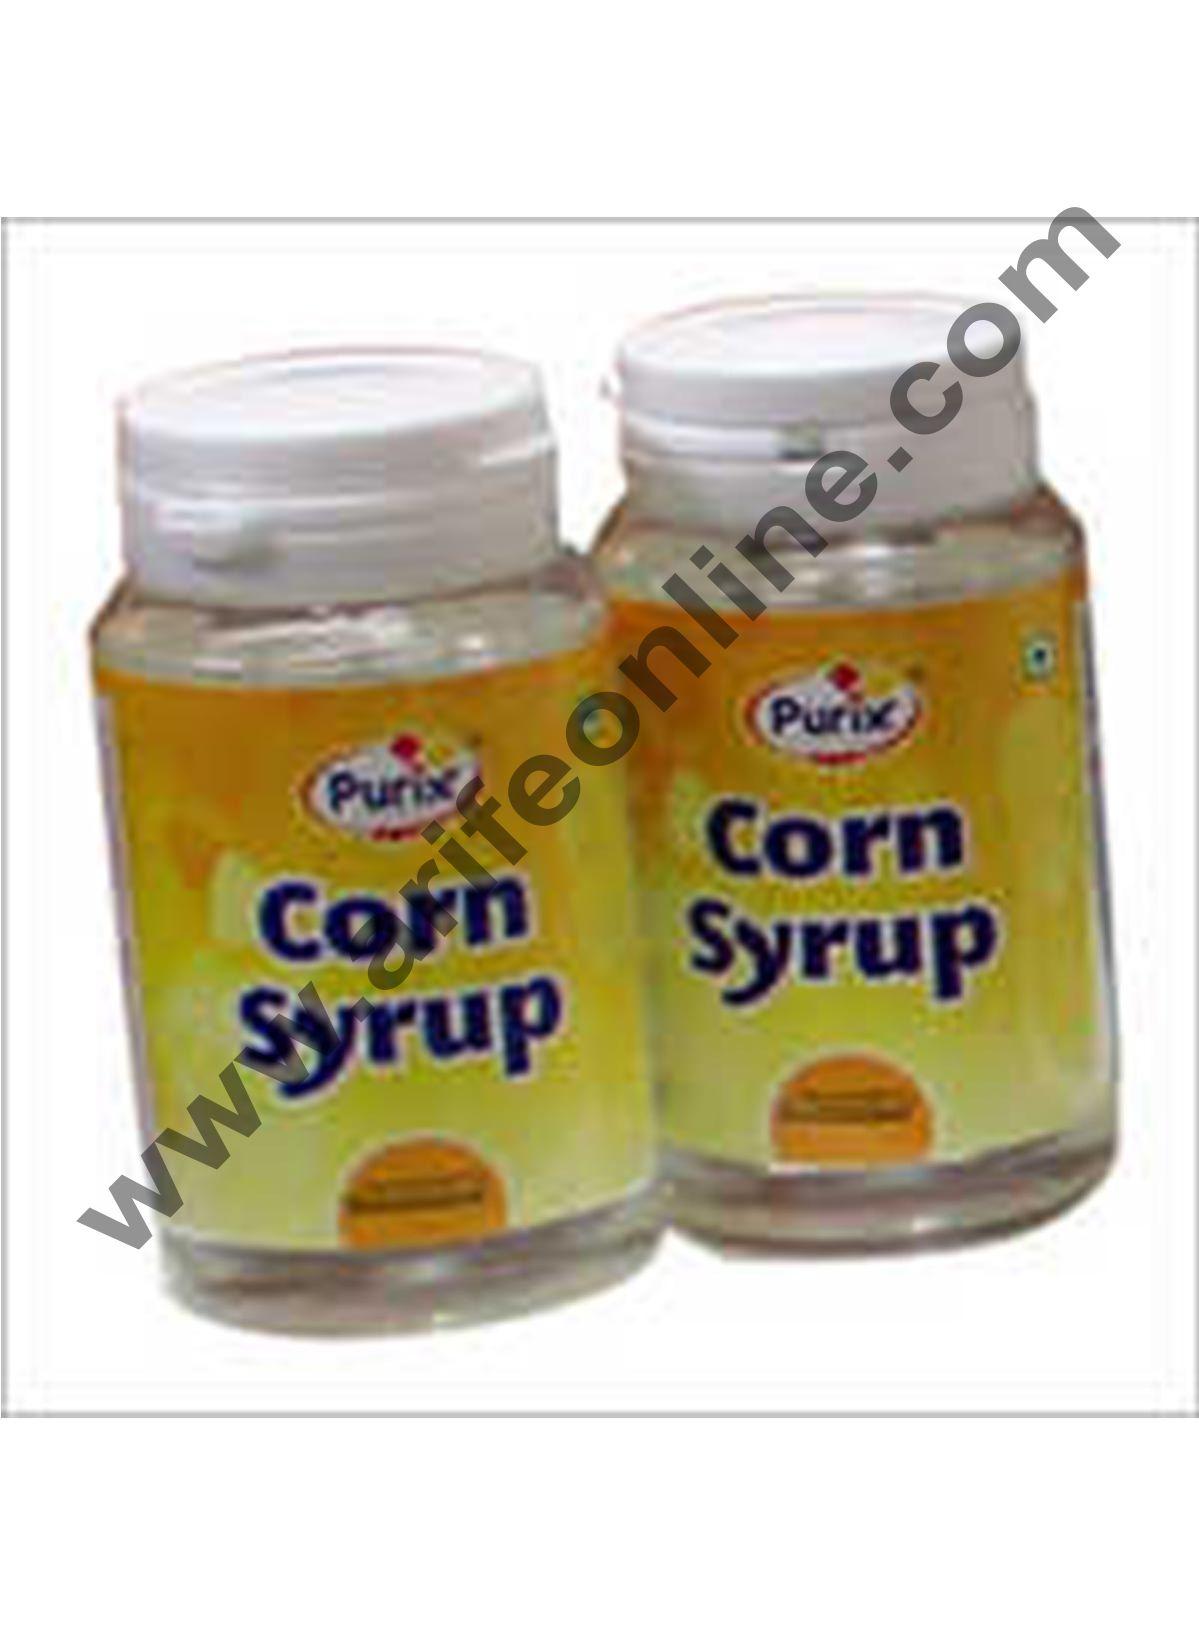 Purix Corn Syrup, 200 Gm